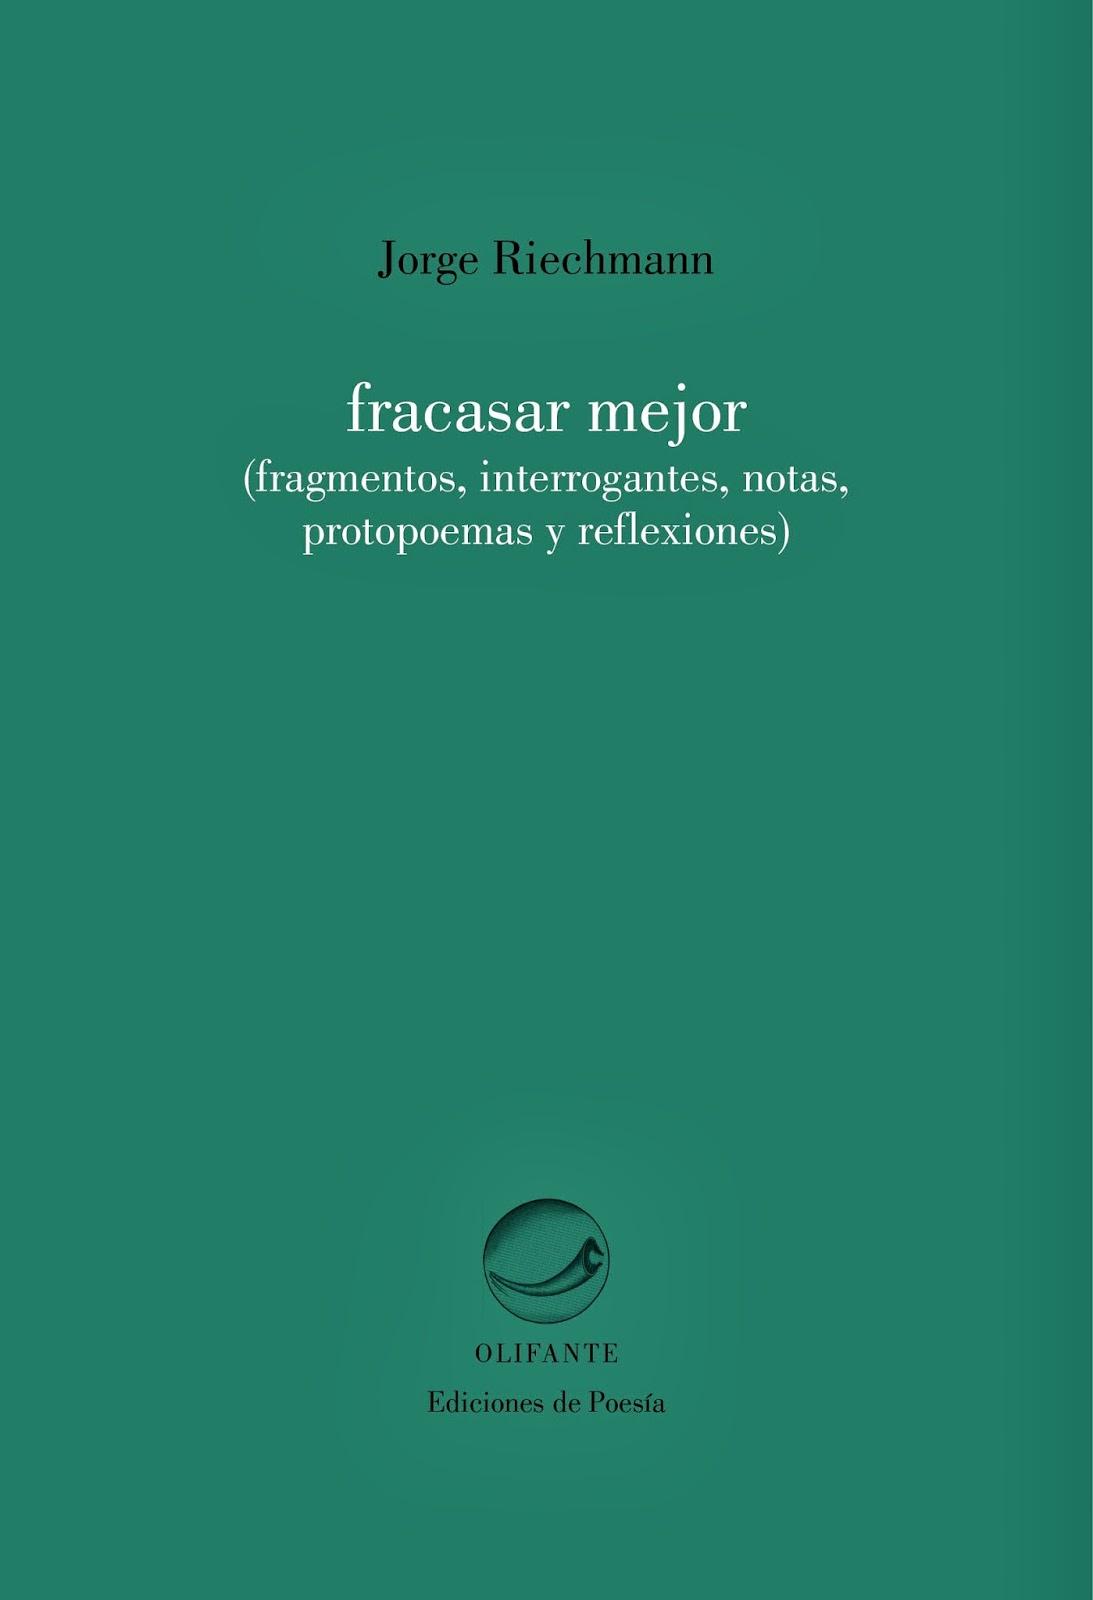 Jorge Riechmann, Máster en Literaturas Hispánicas, Universidad Autónoma de Madrid